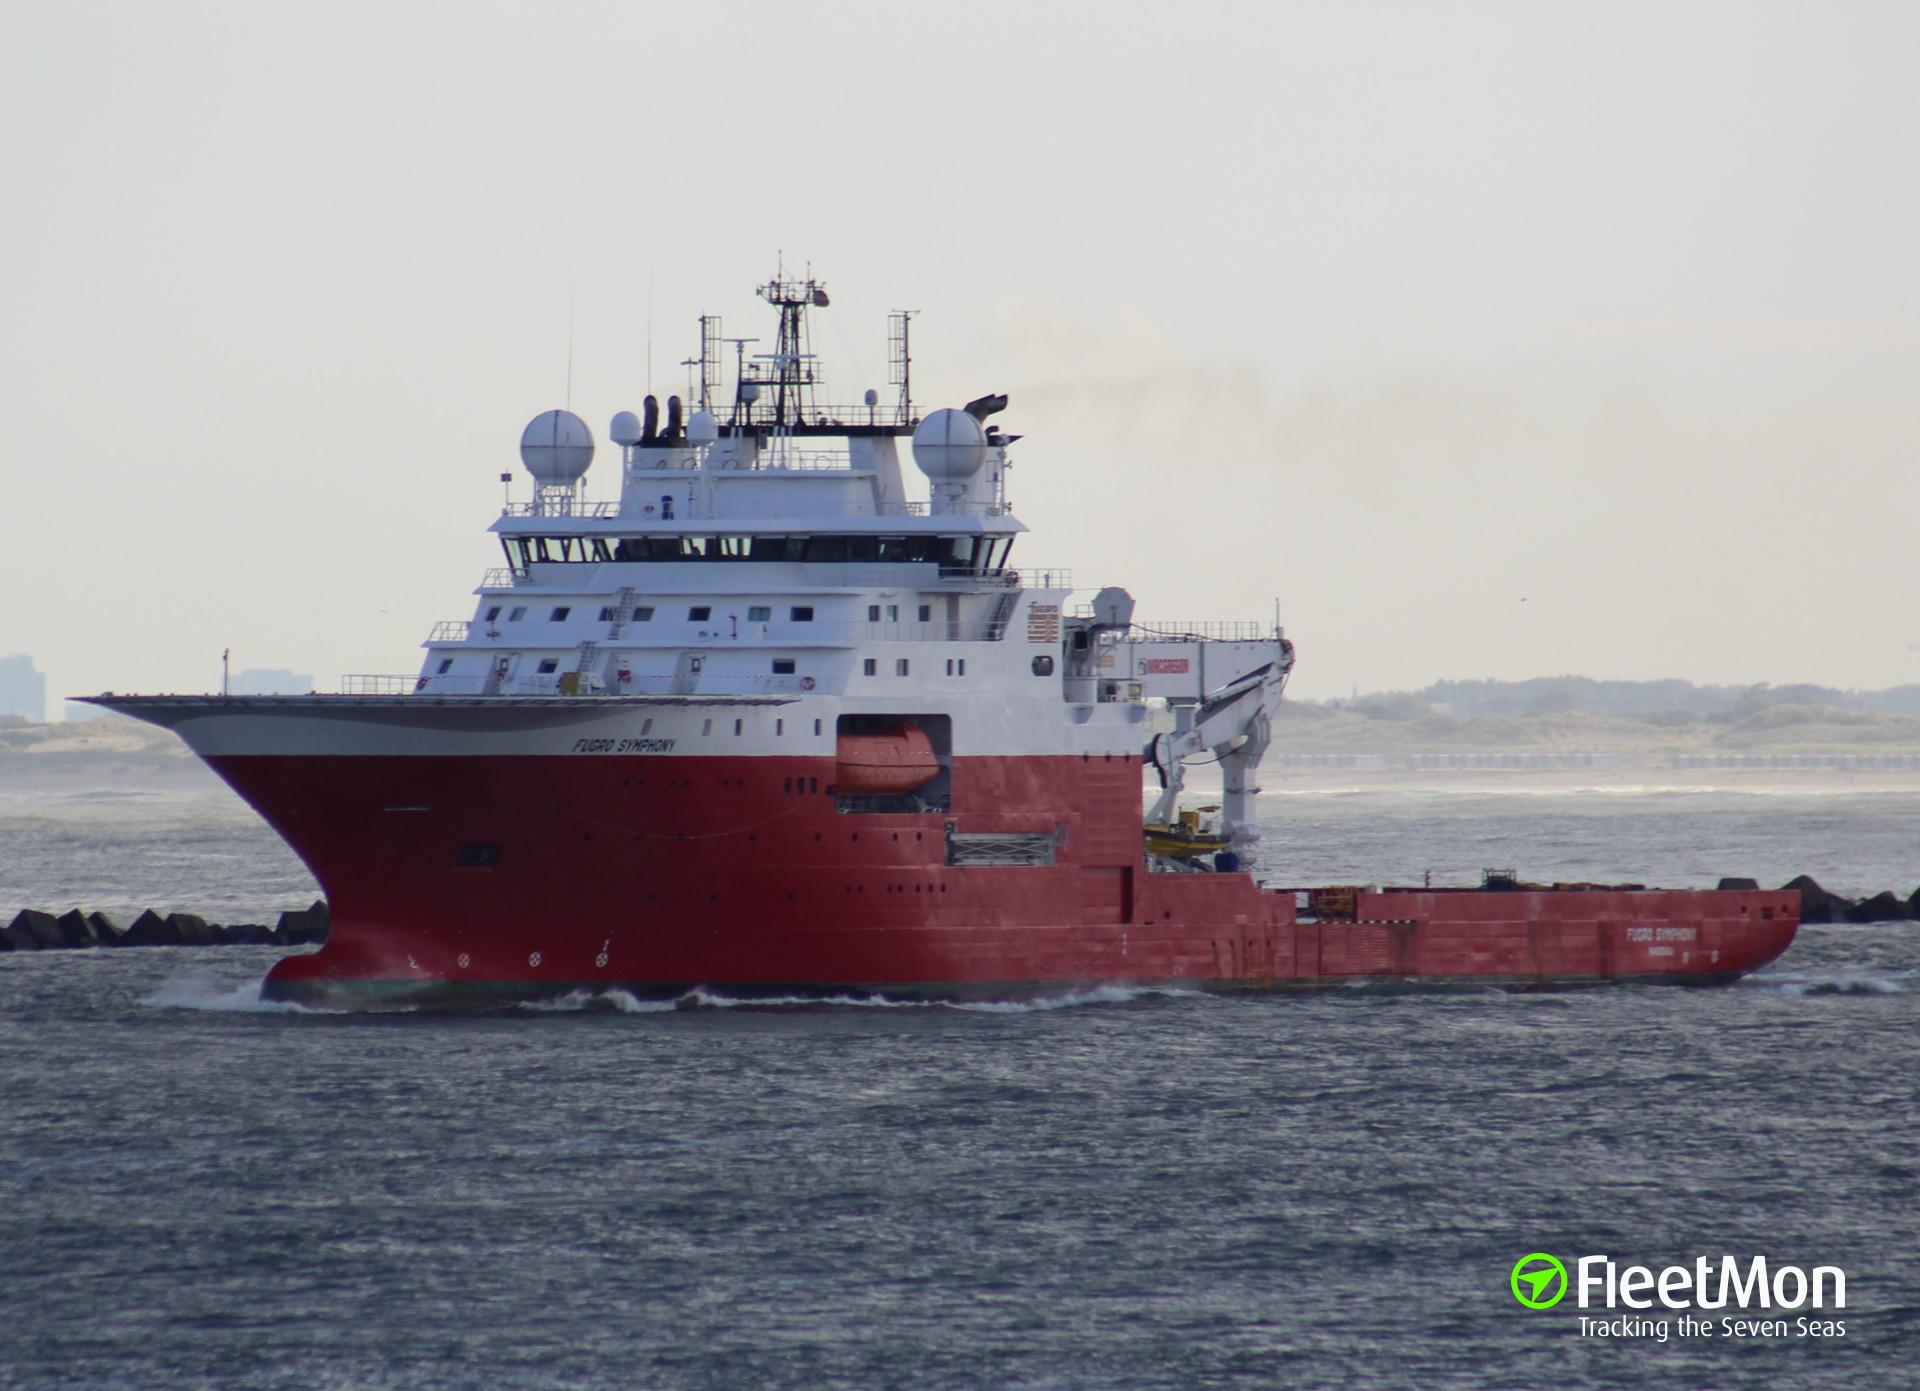 Fire on board of offshore supply vessel, Scotland